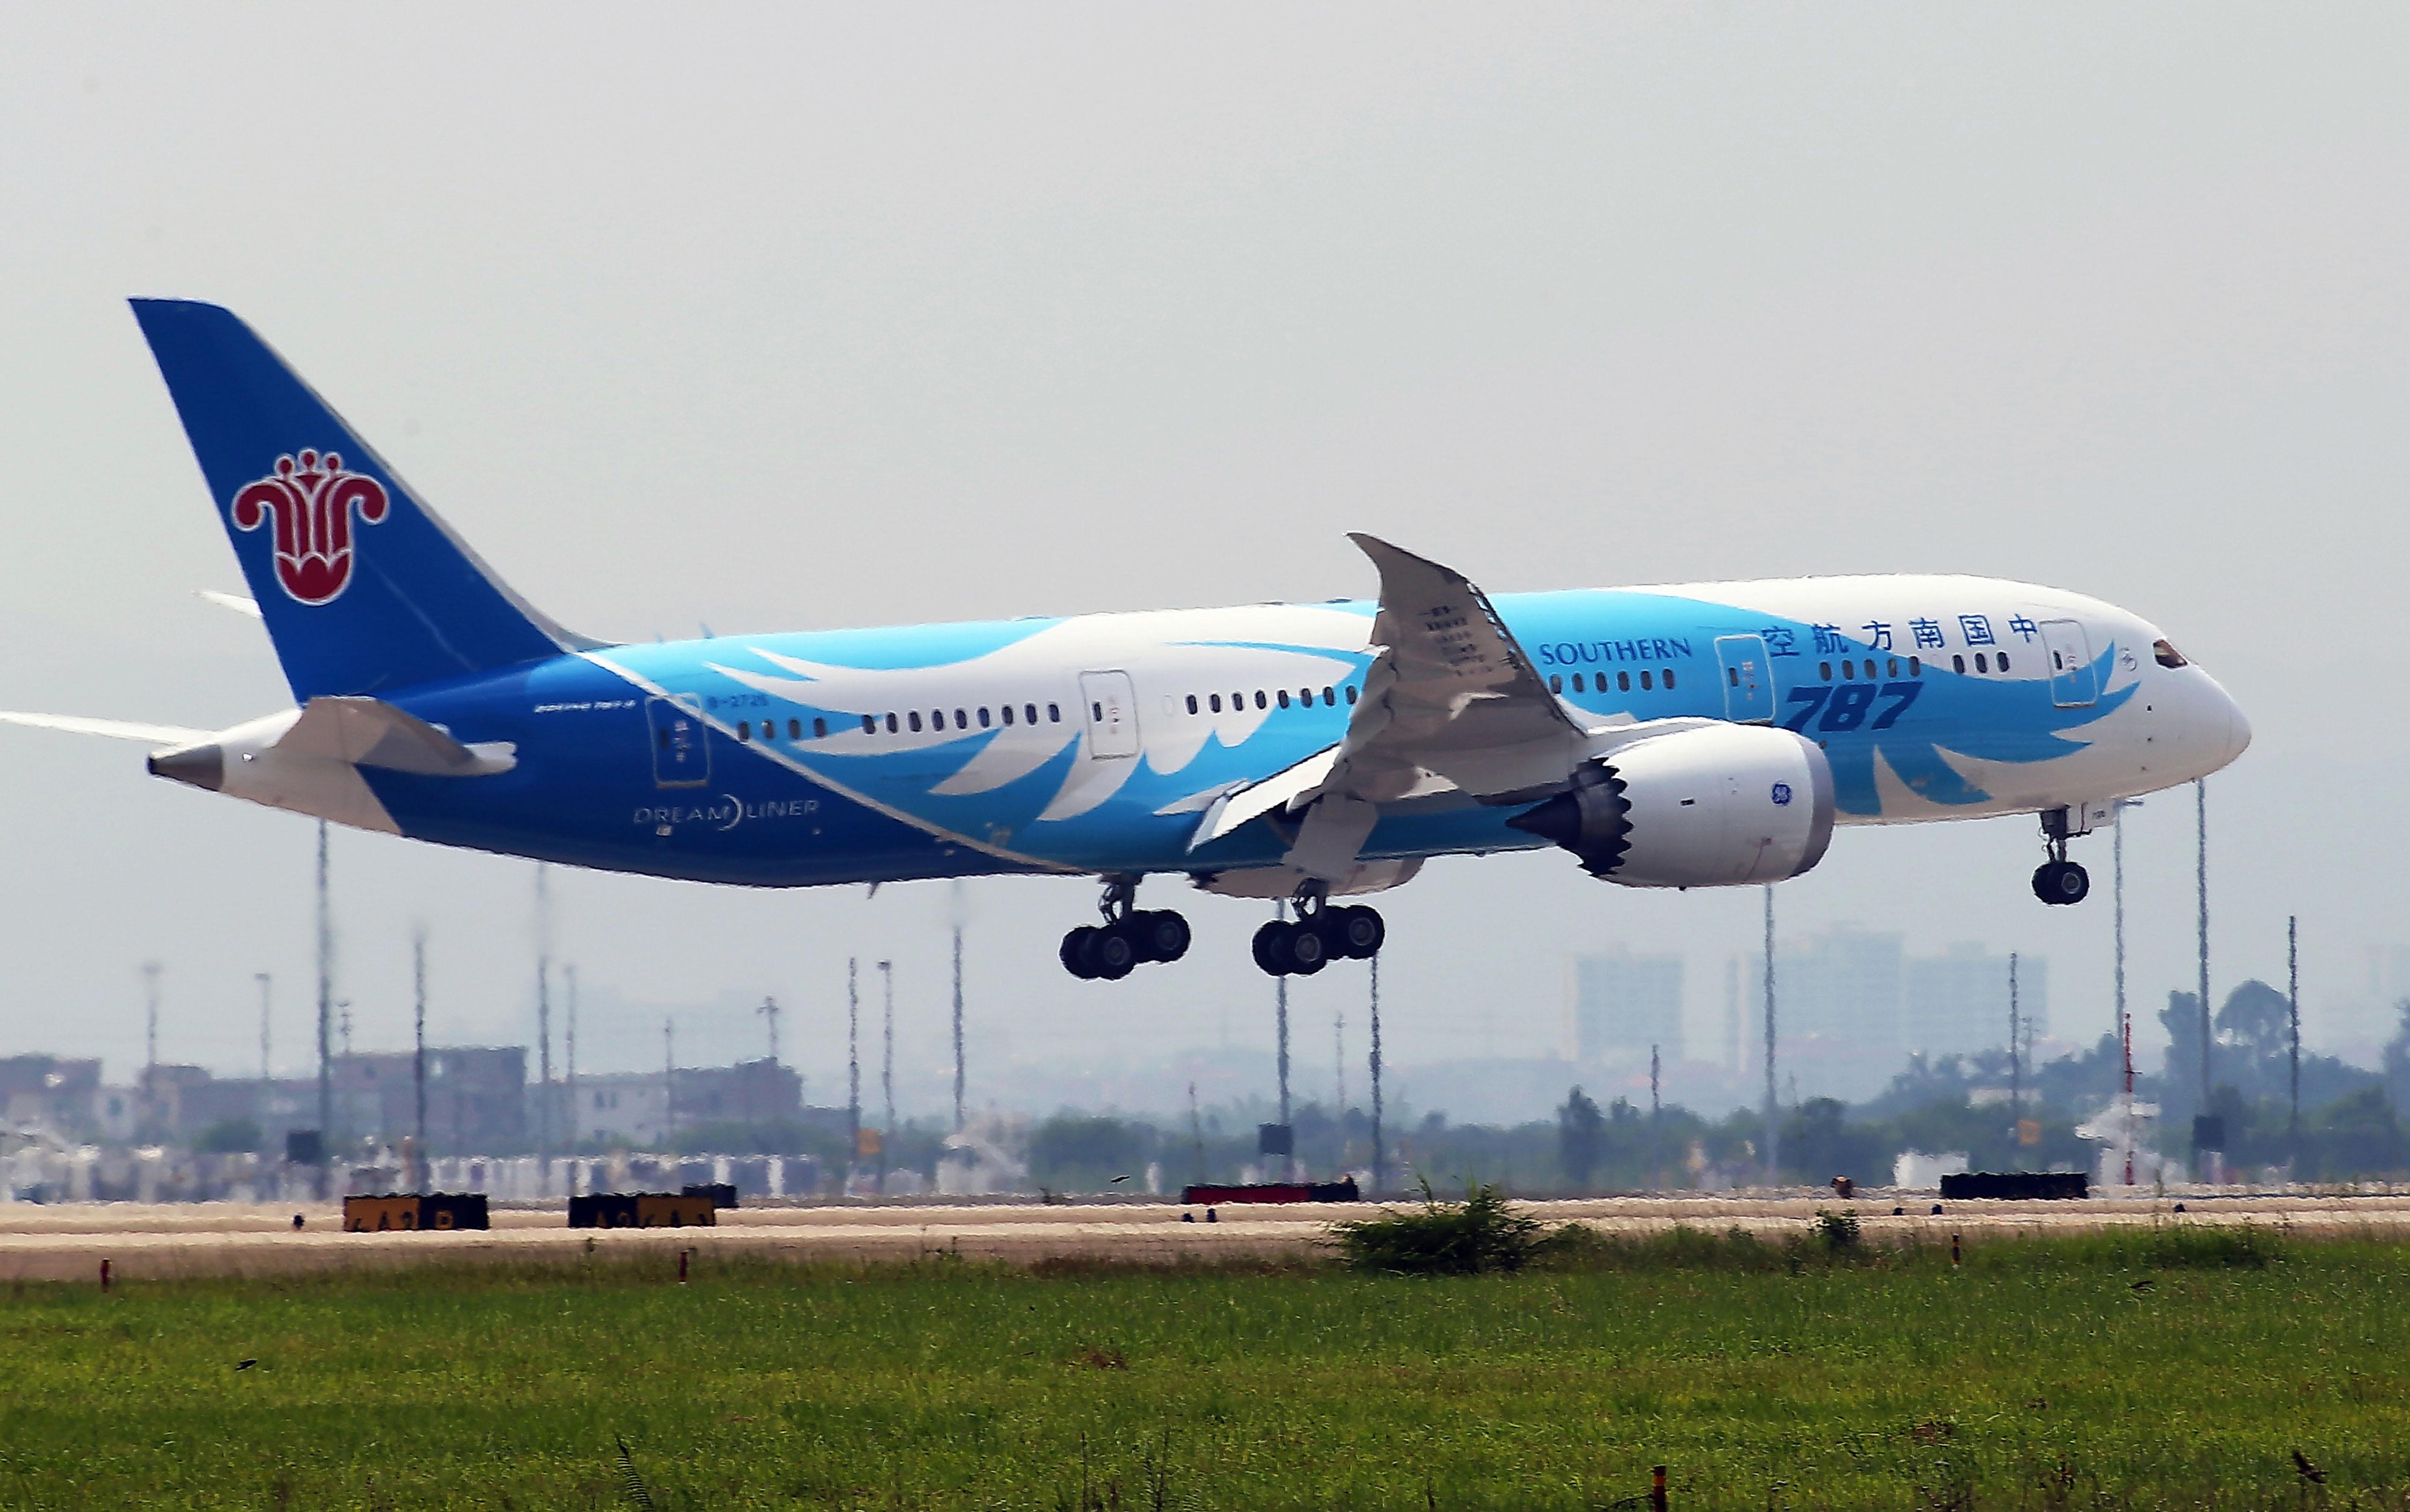 CHINA-US-AVIATION-AEROSPACE-COMPANY-BOEING